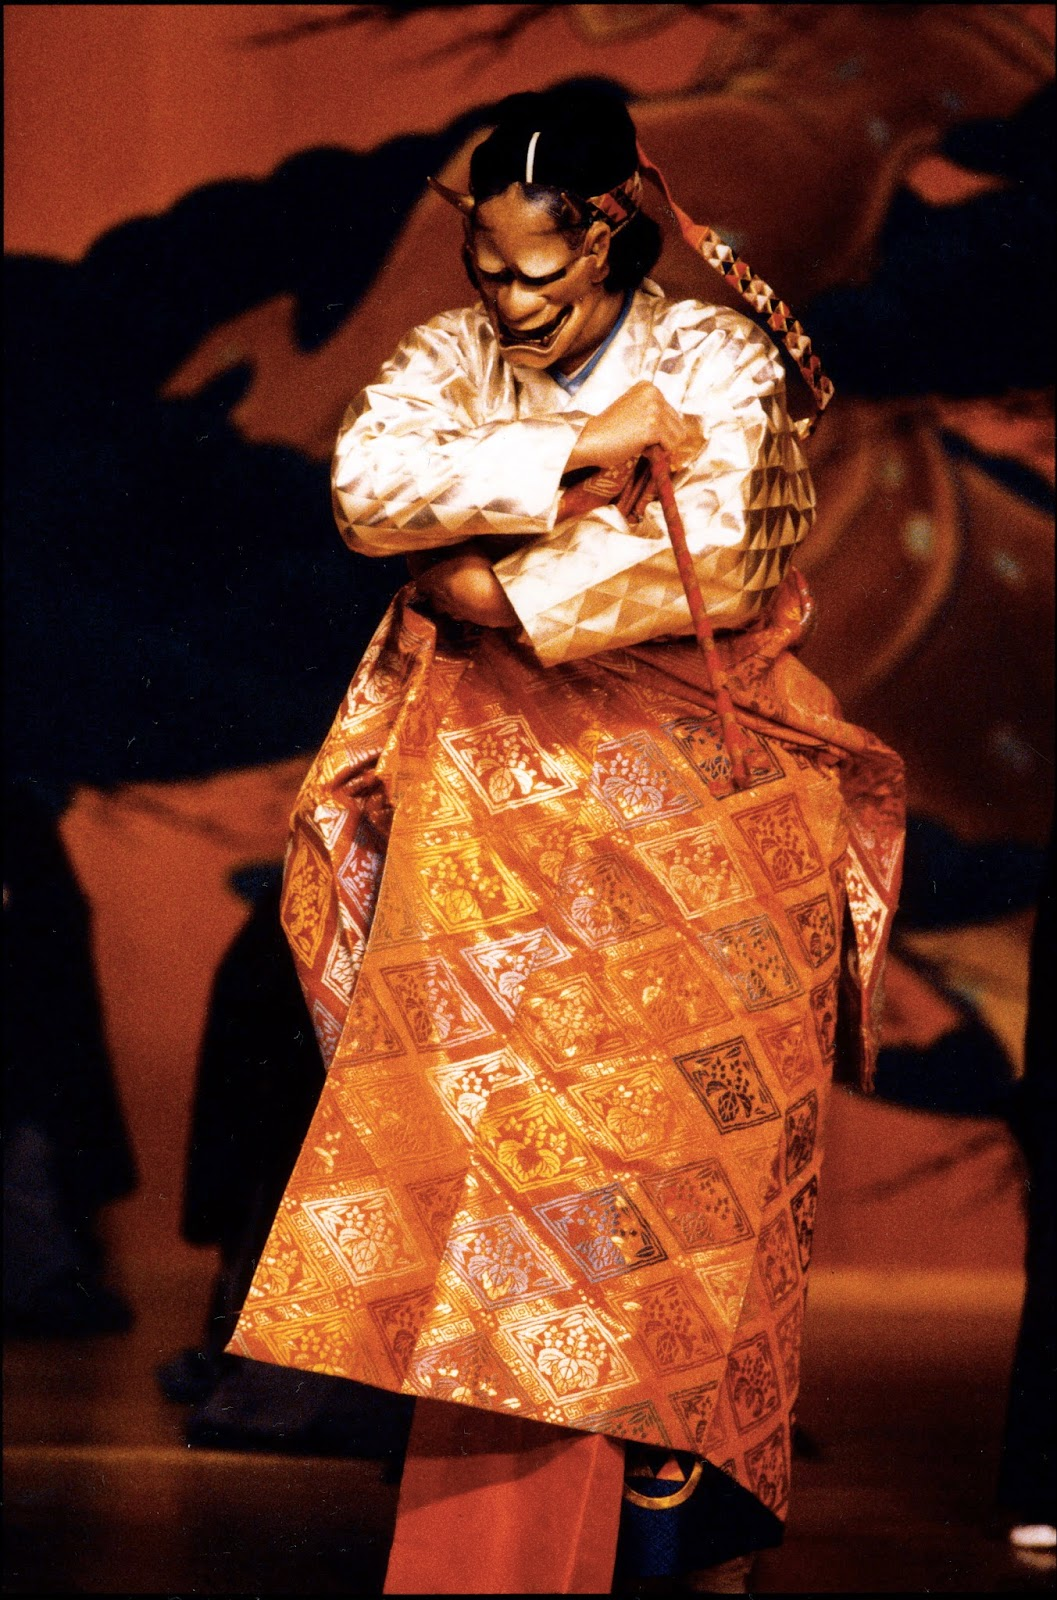 Naotomo Umewaka